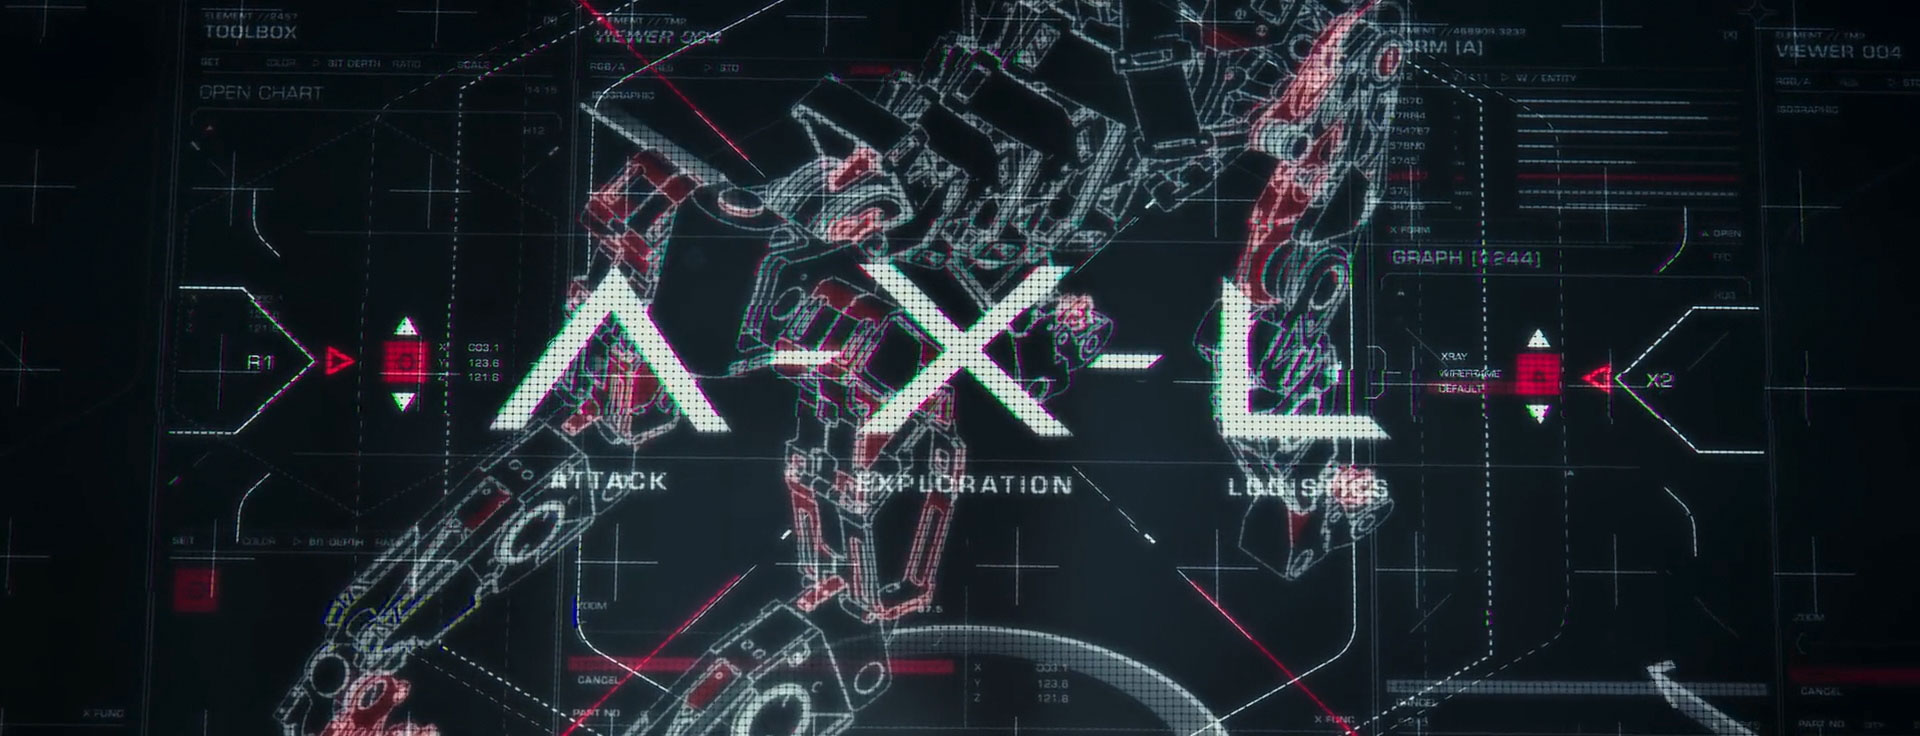 AXL_MOE_06.jpg